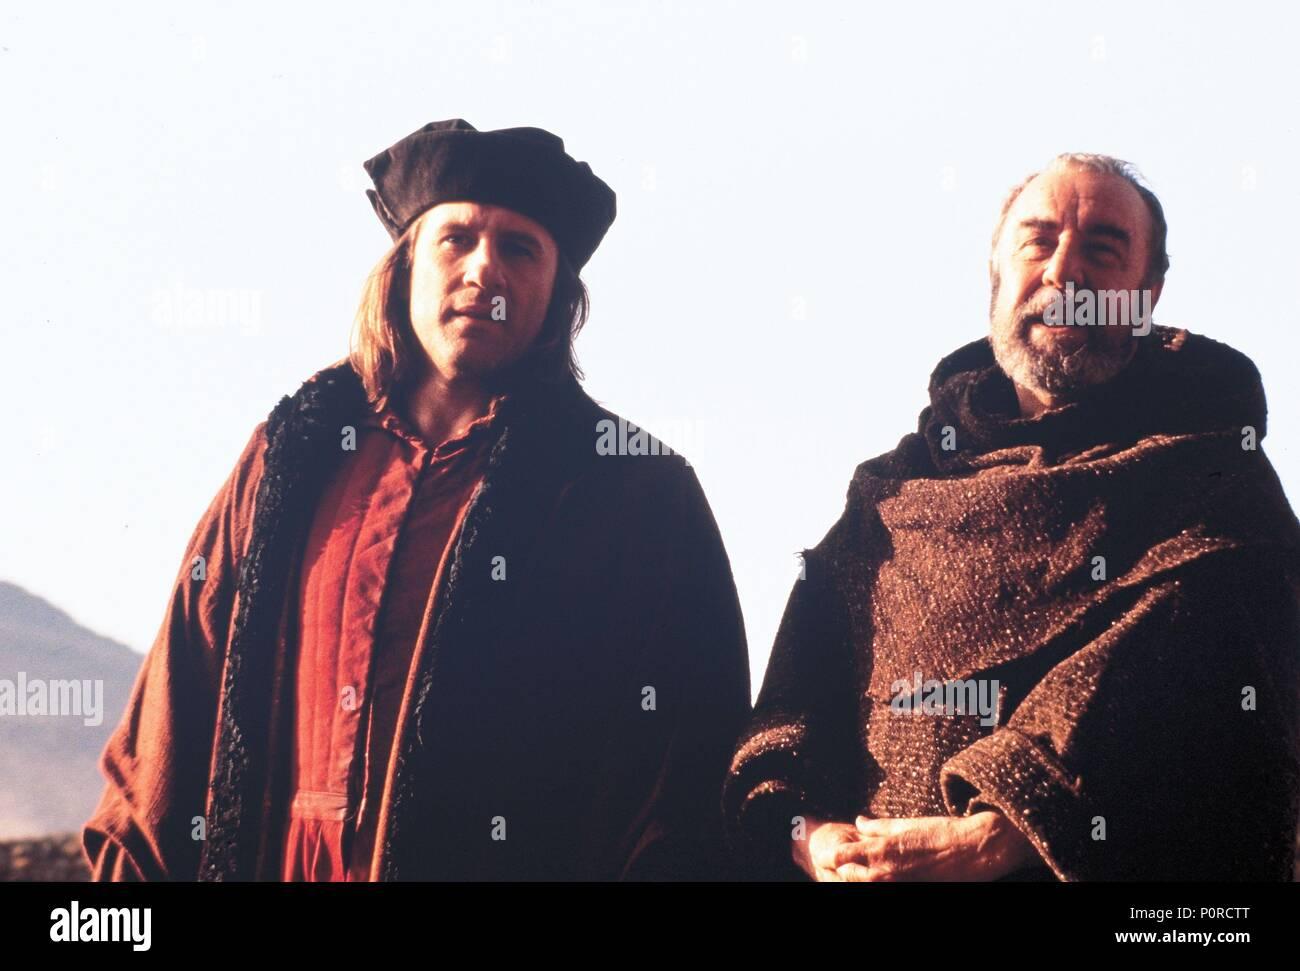 ¿Cuánto mide Fernando Rey? Original-film-title-1492-conquest-of-paradise-english-title-1492-conquest-of-paradise-film-director-ridley-scott-year-1992-stars-fernando-rey-gerard-depardieu-credit-due-west-legend-cyrk-album-P0RCTT